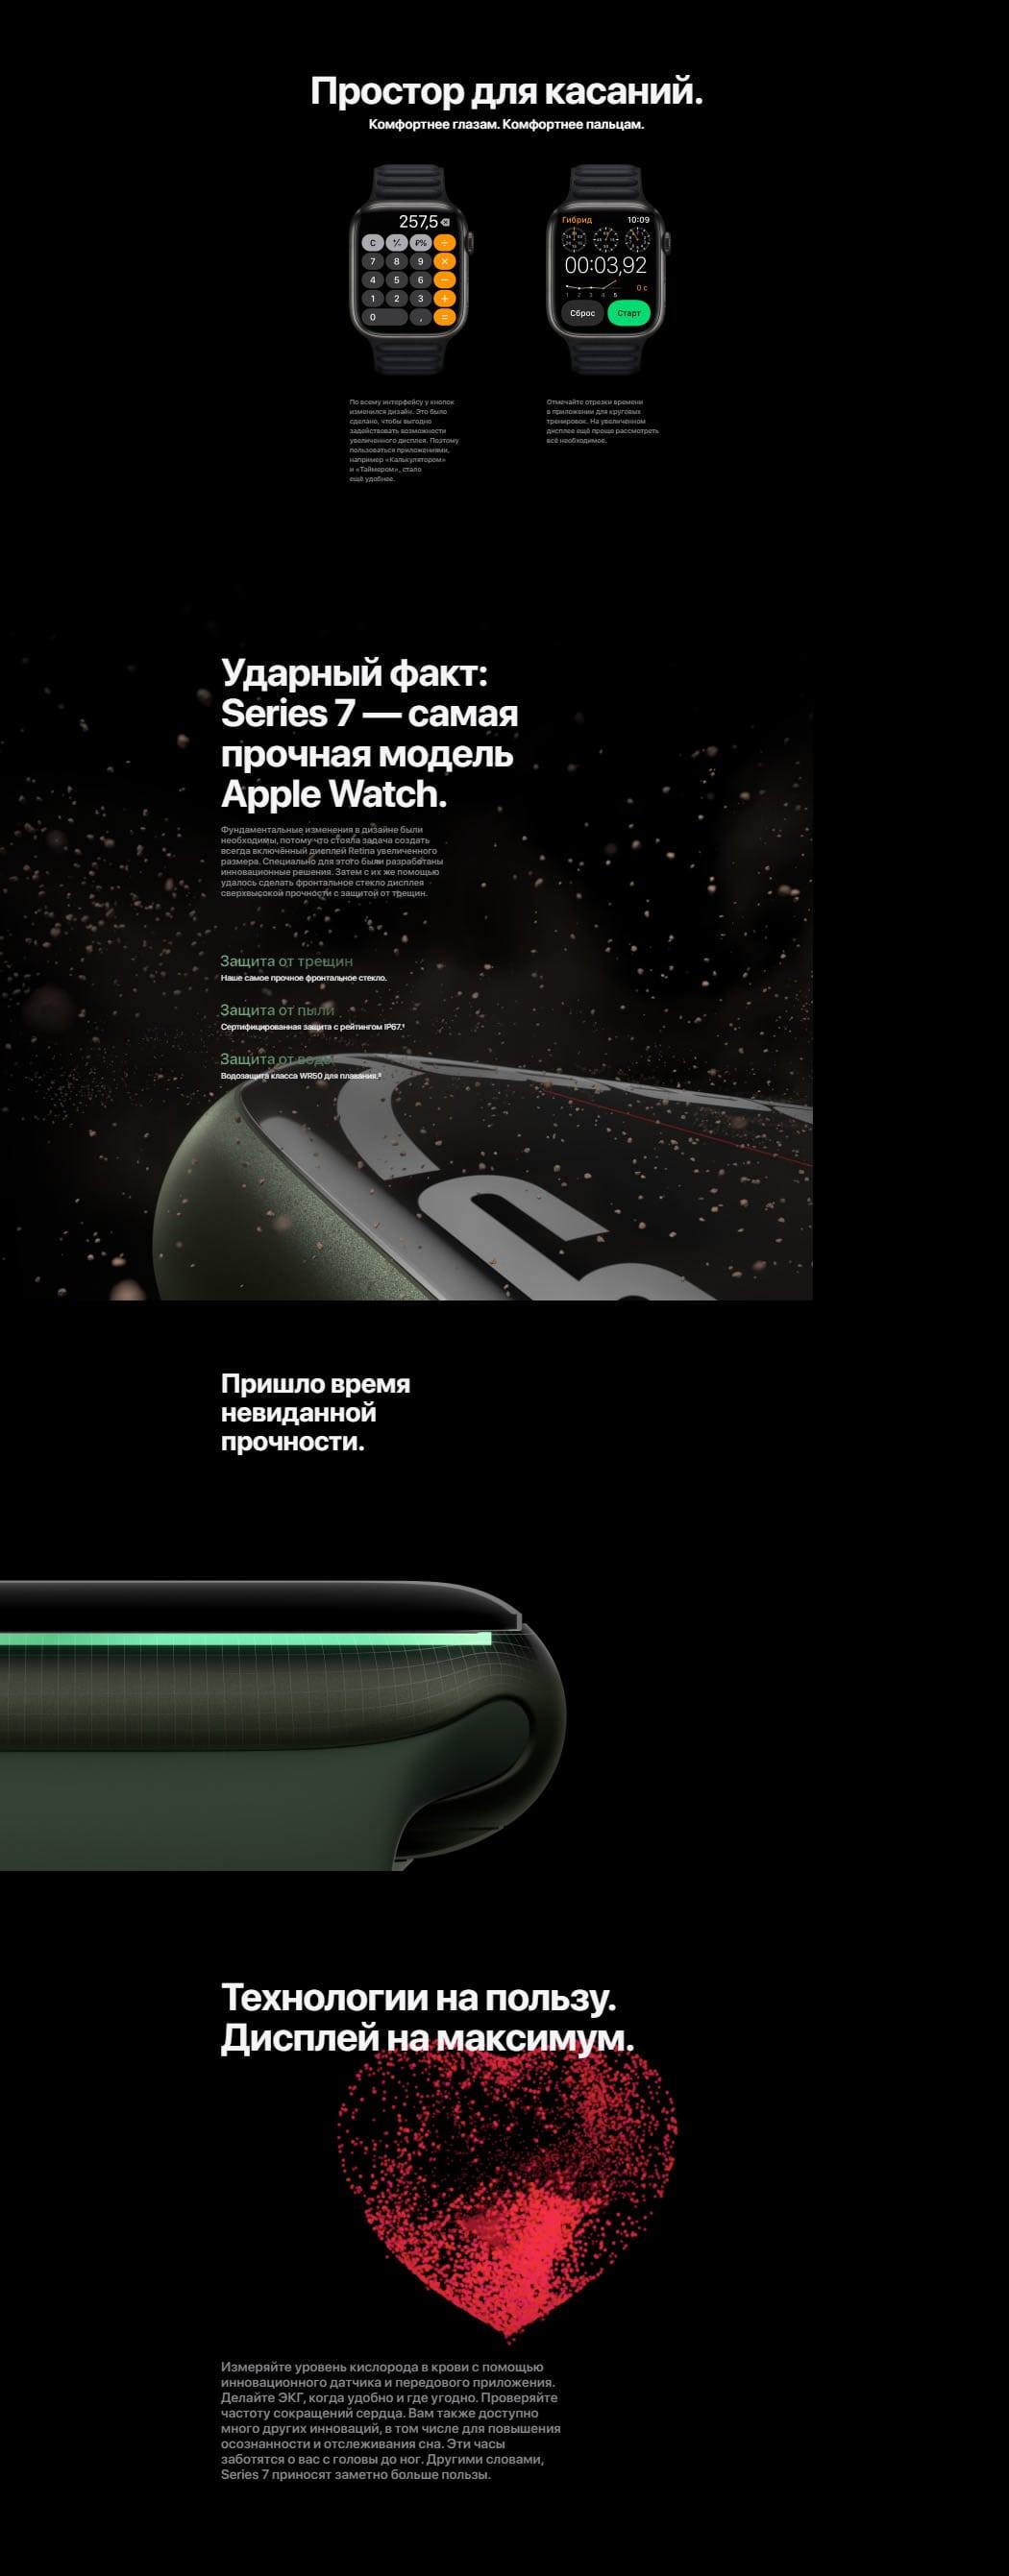 Apple Watch S7 Москва